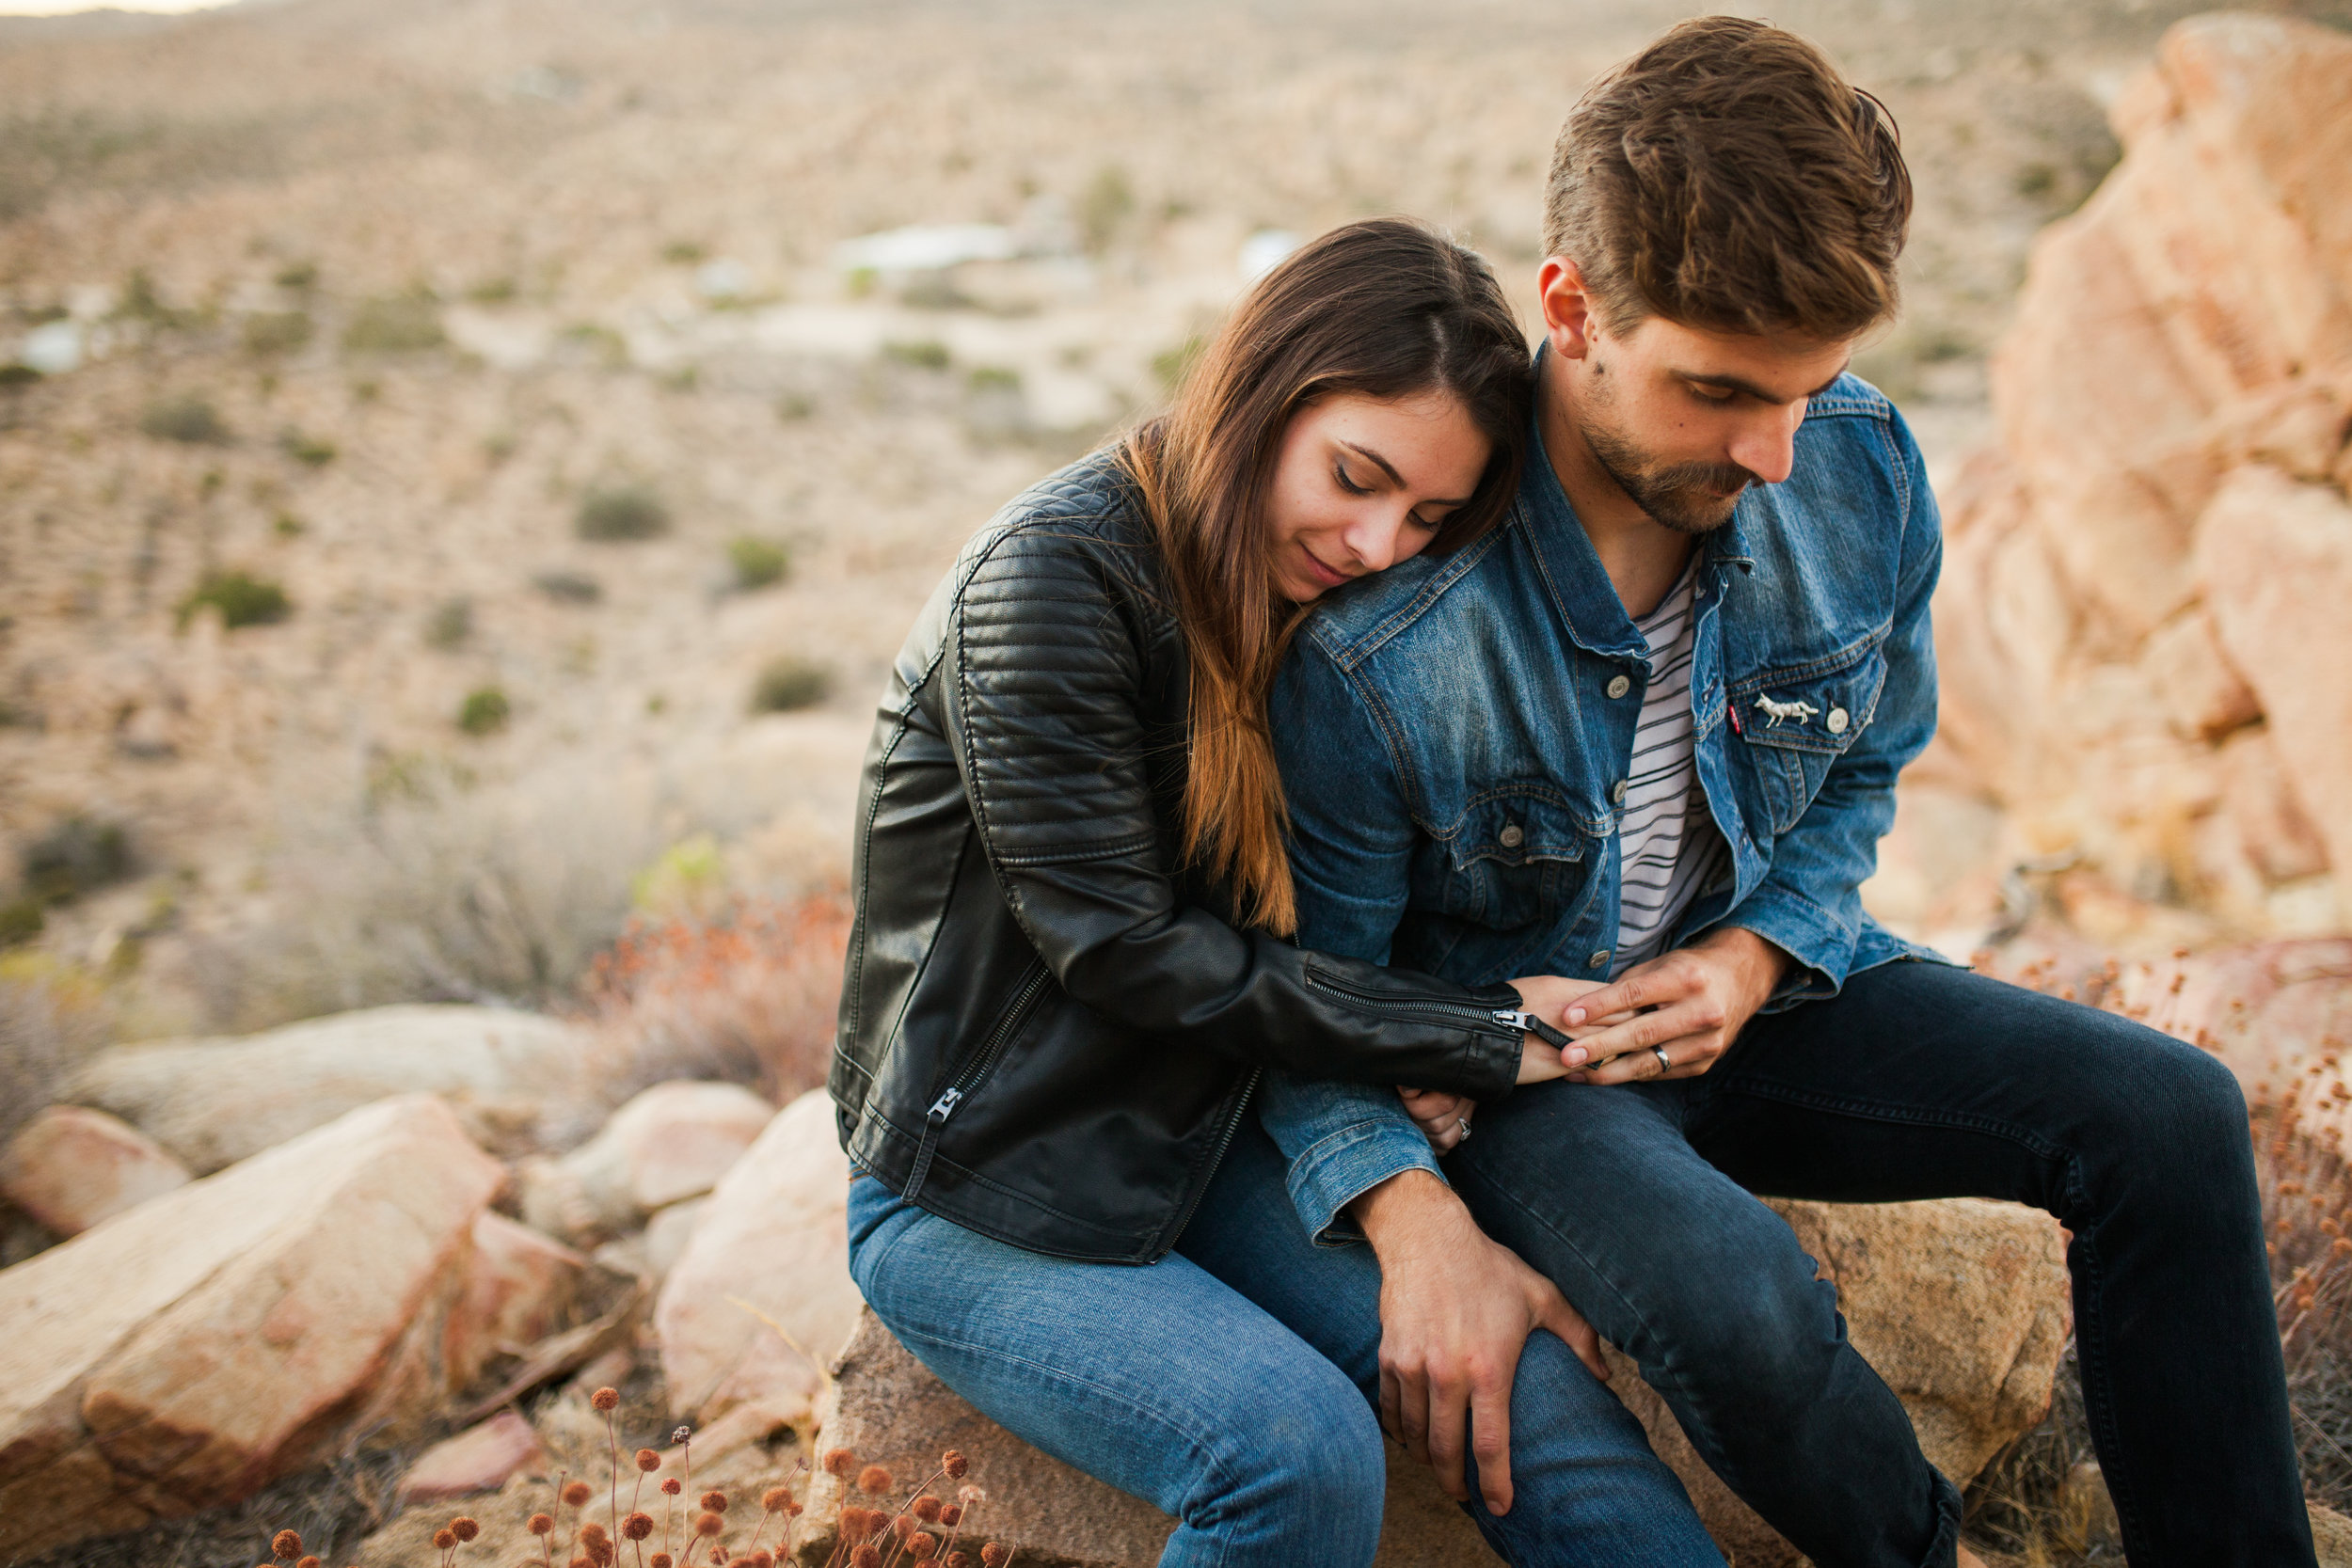 Desert Anniversary Couple's session in Joshua tree, california